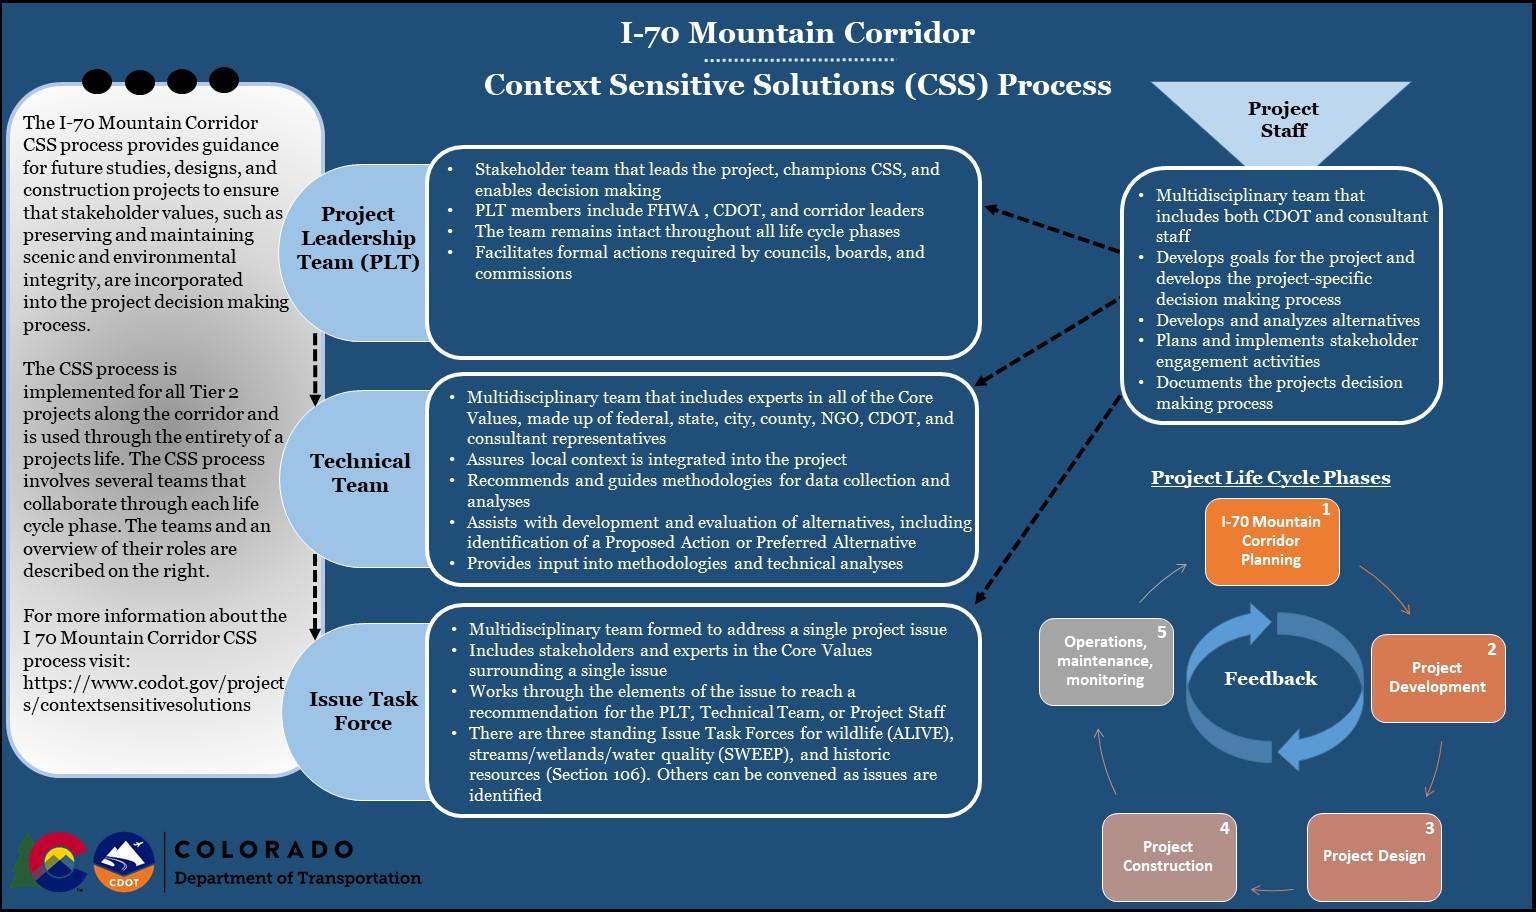 Context Sensitive Solution Process_Visual Information.JPG detail image